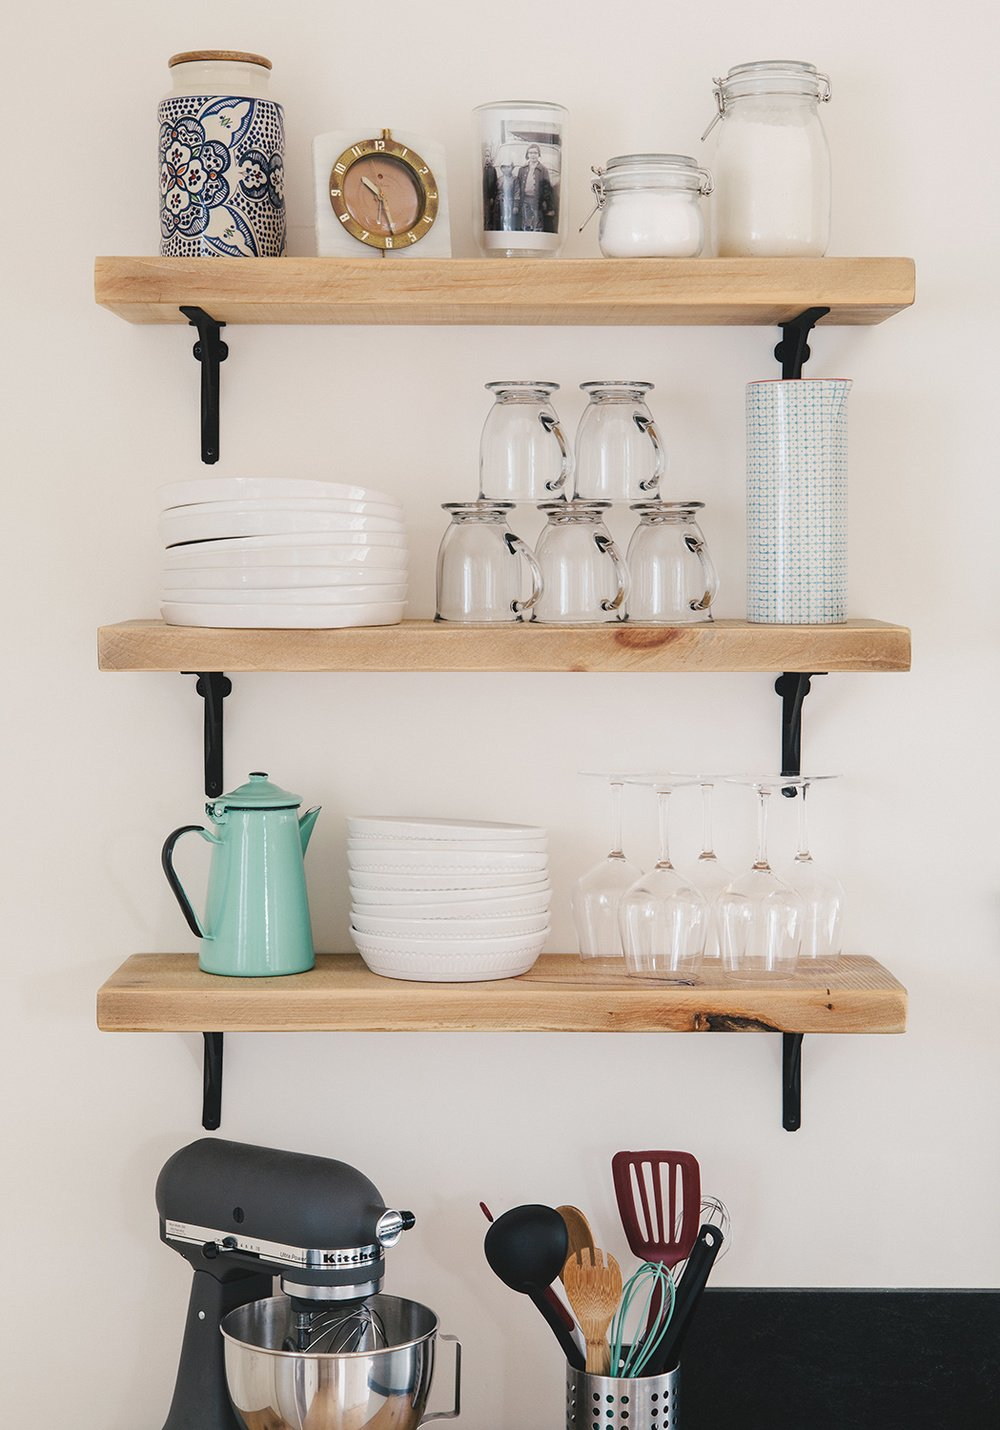 kitchen shelves (image credit: svk interior design) JYPSZFI